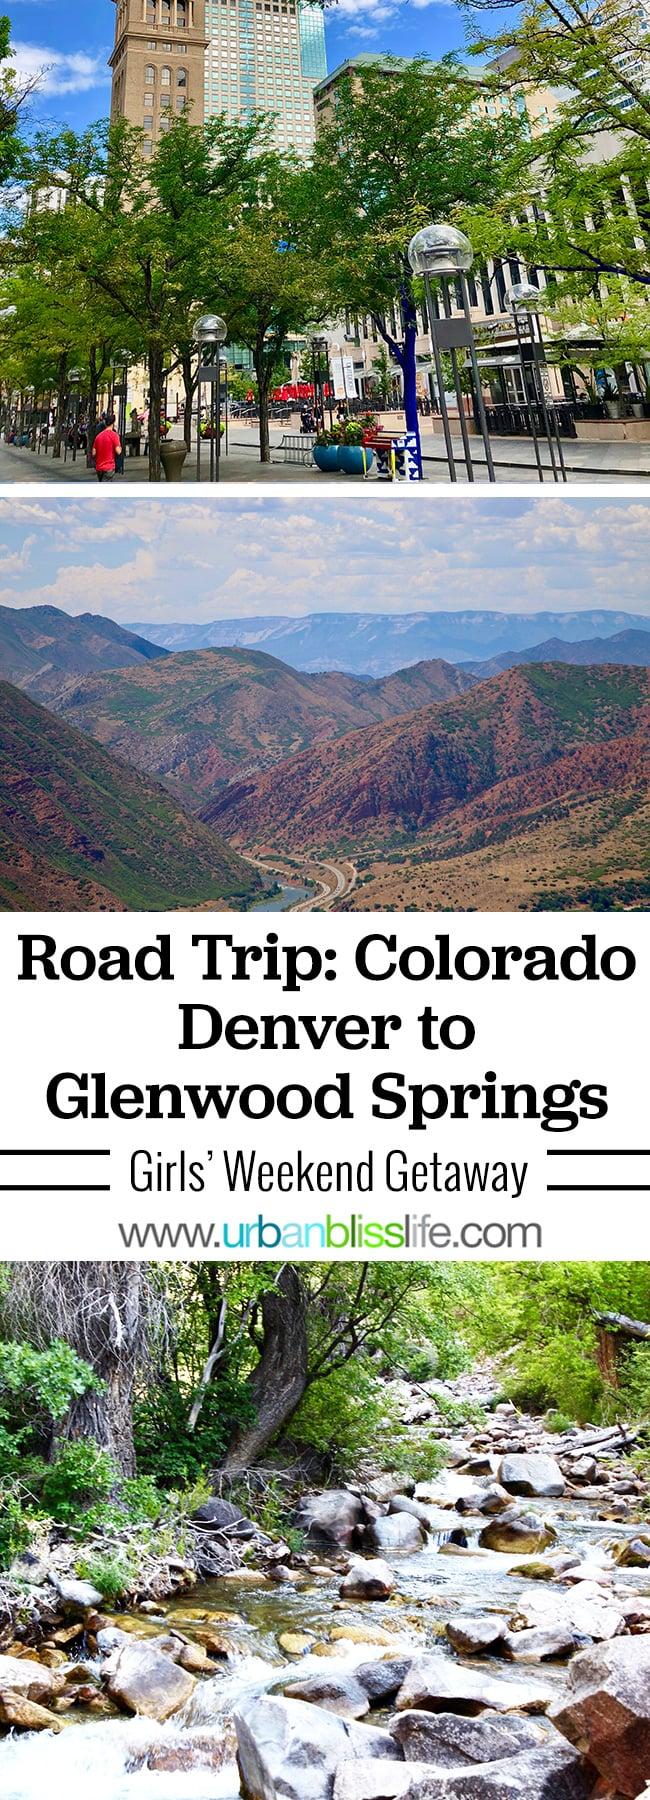 Girls Getaway Weekend Road Trip! Destination: Denver, Colorado to Glenwood Springs, Colorado. Travel guide on UrbanBlissLife.com